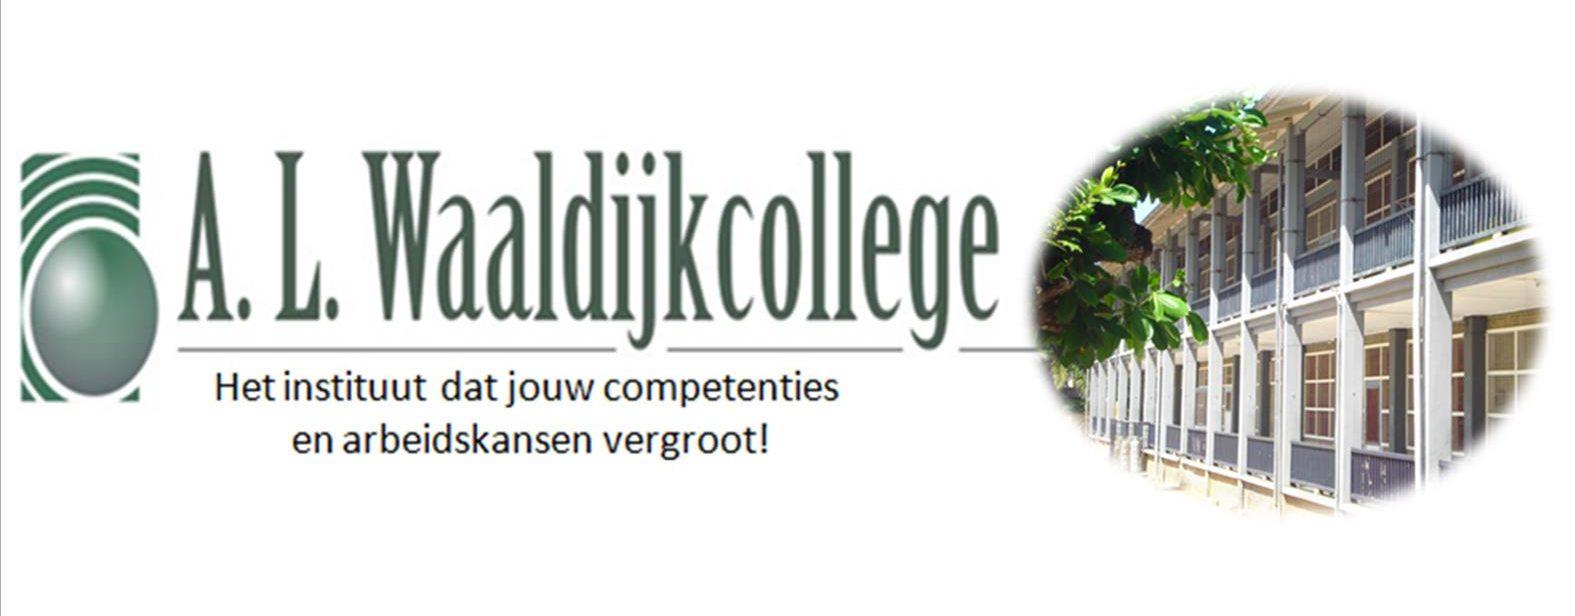 A.L. Waaldijkcollege